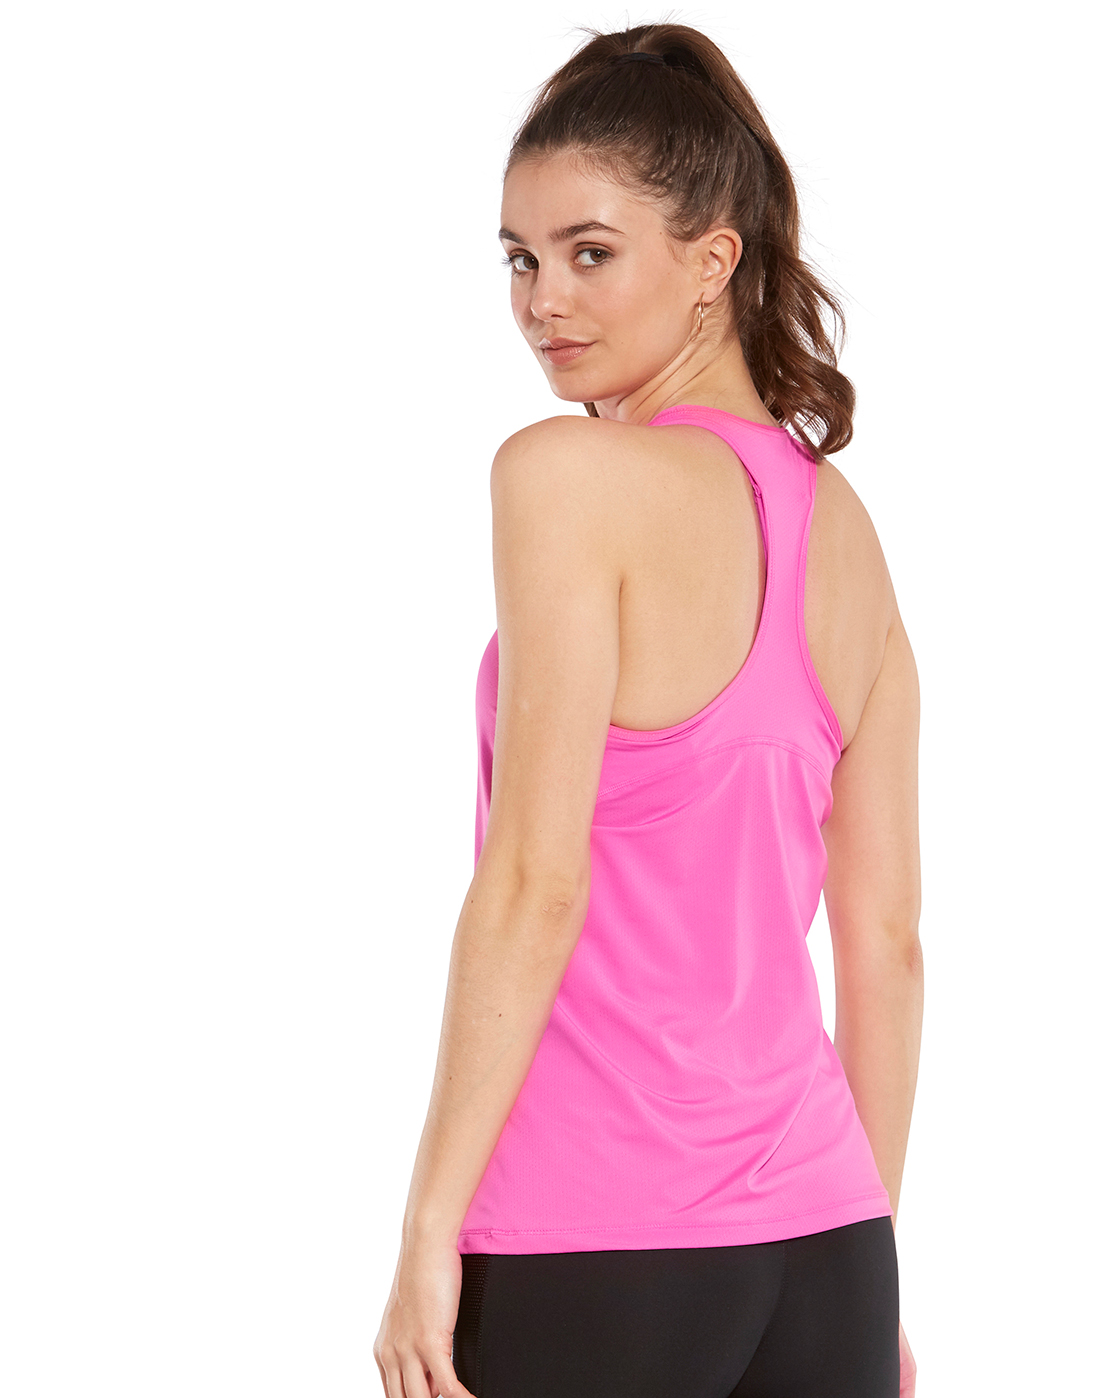 c6b0df23 Nike Womens Pro Tank Top